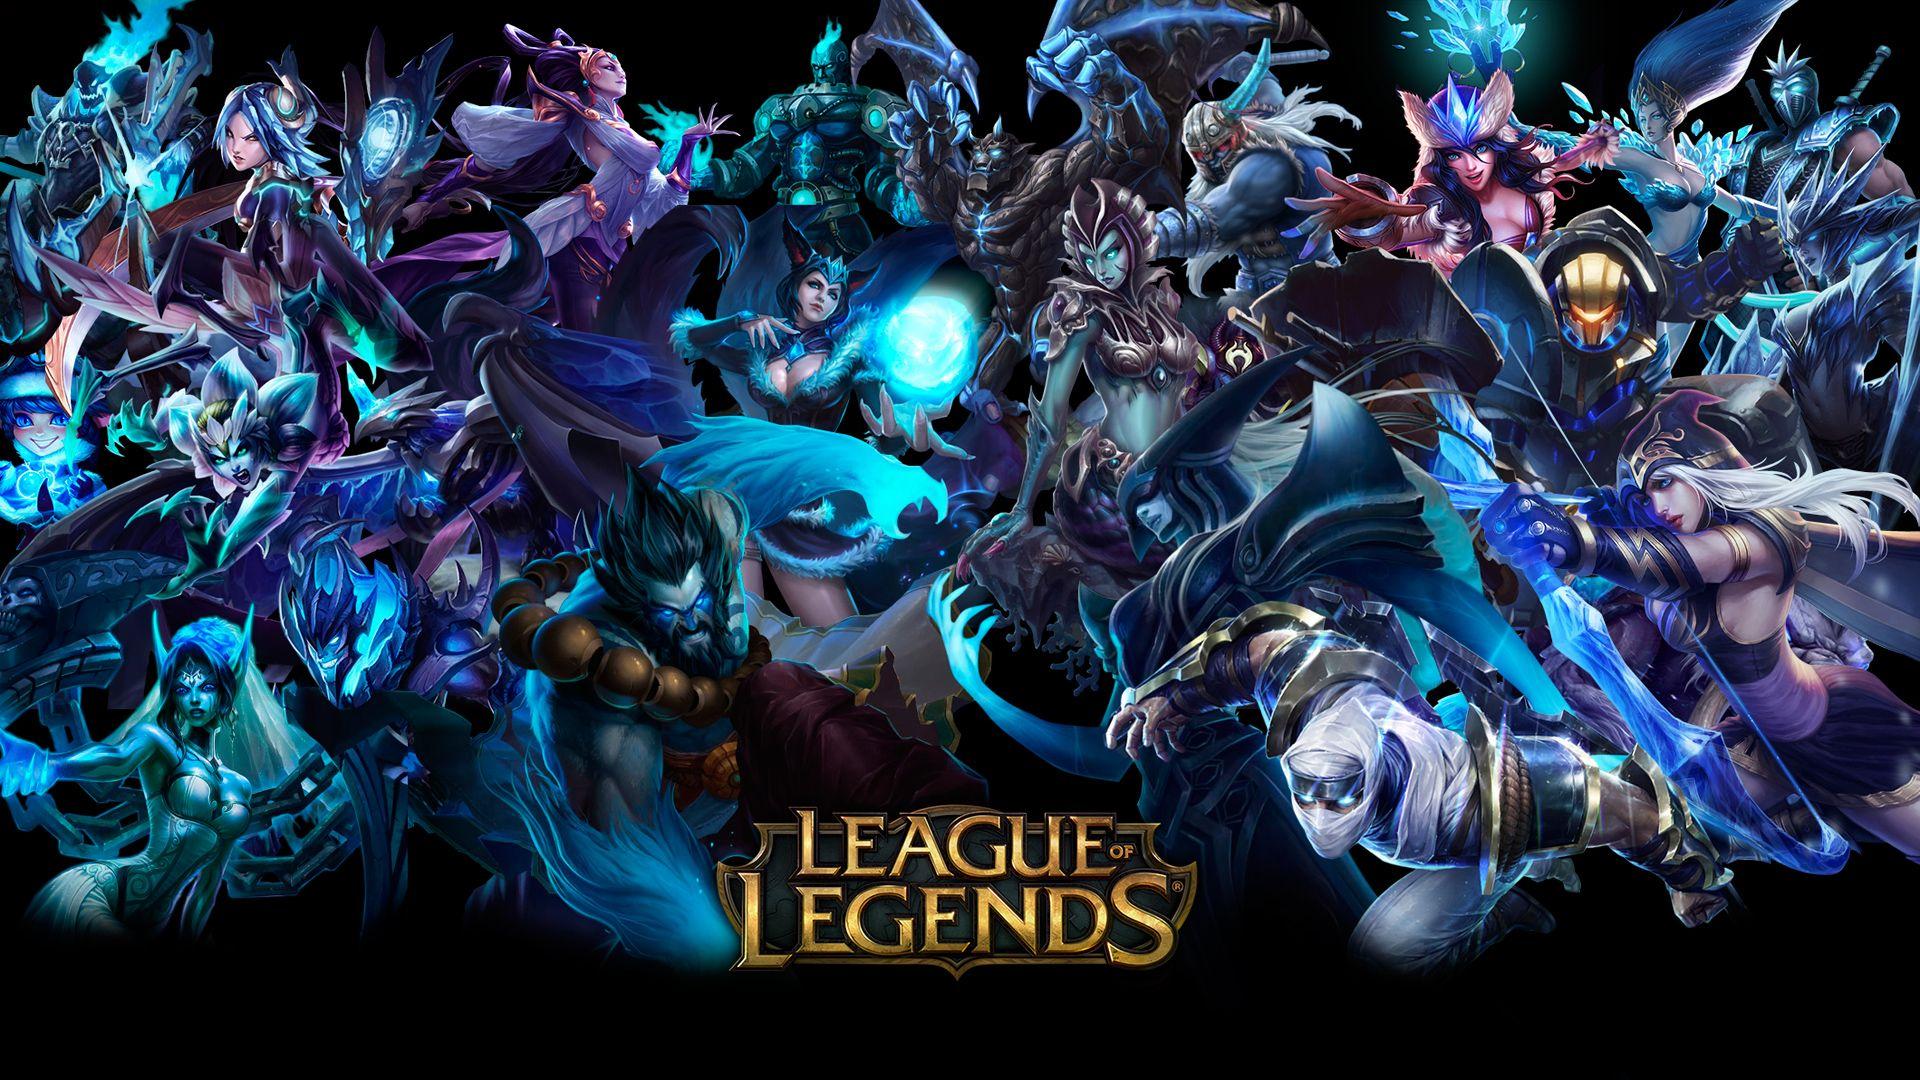 Garen League Of Legends HD Wallpapers Backgrounds